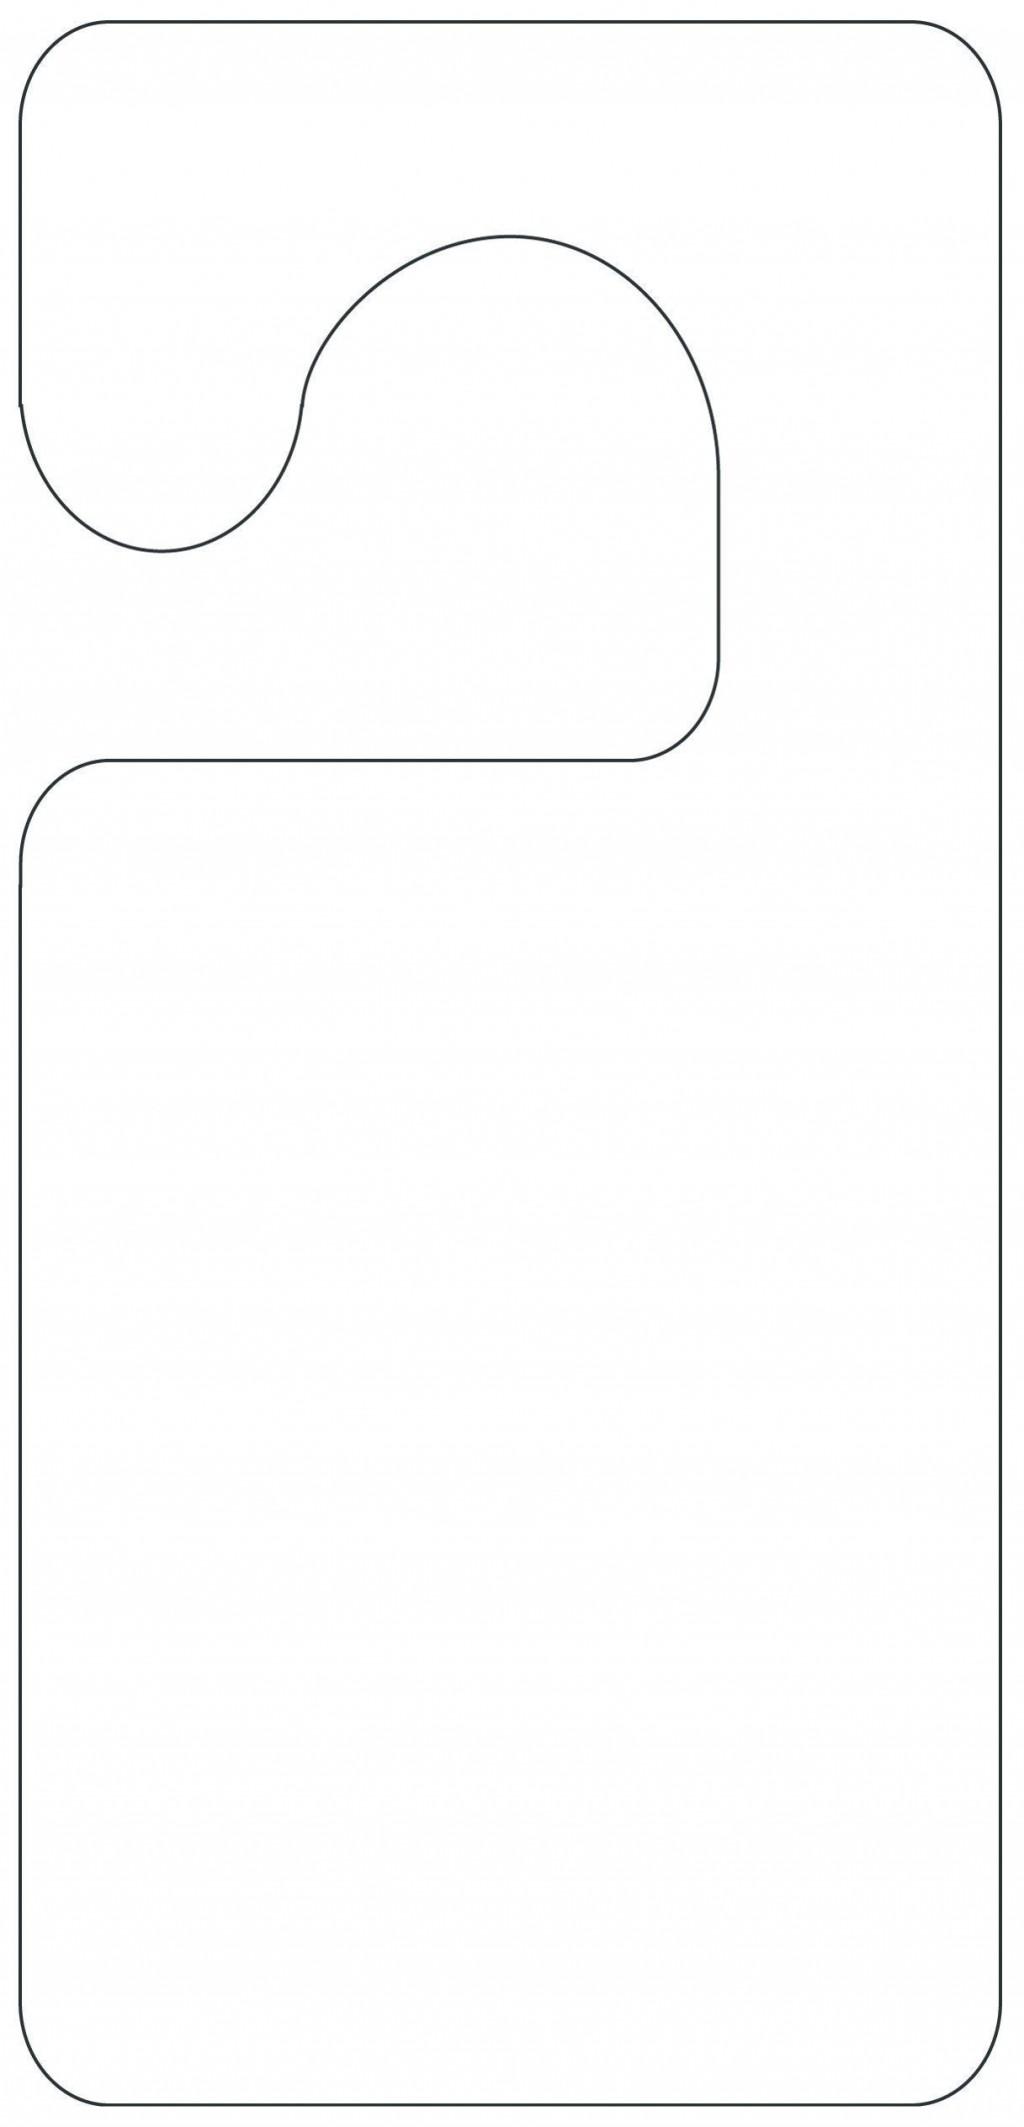 004 Unforgettable Blank Door Hanger Template Free Example Large